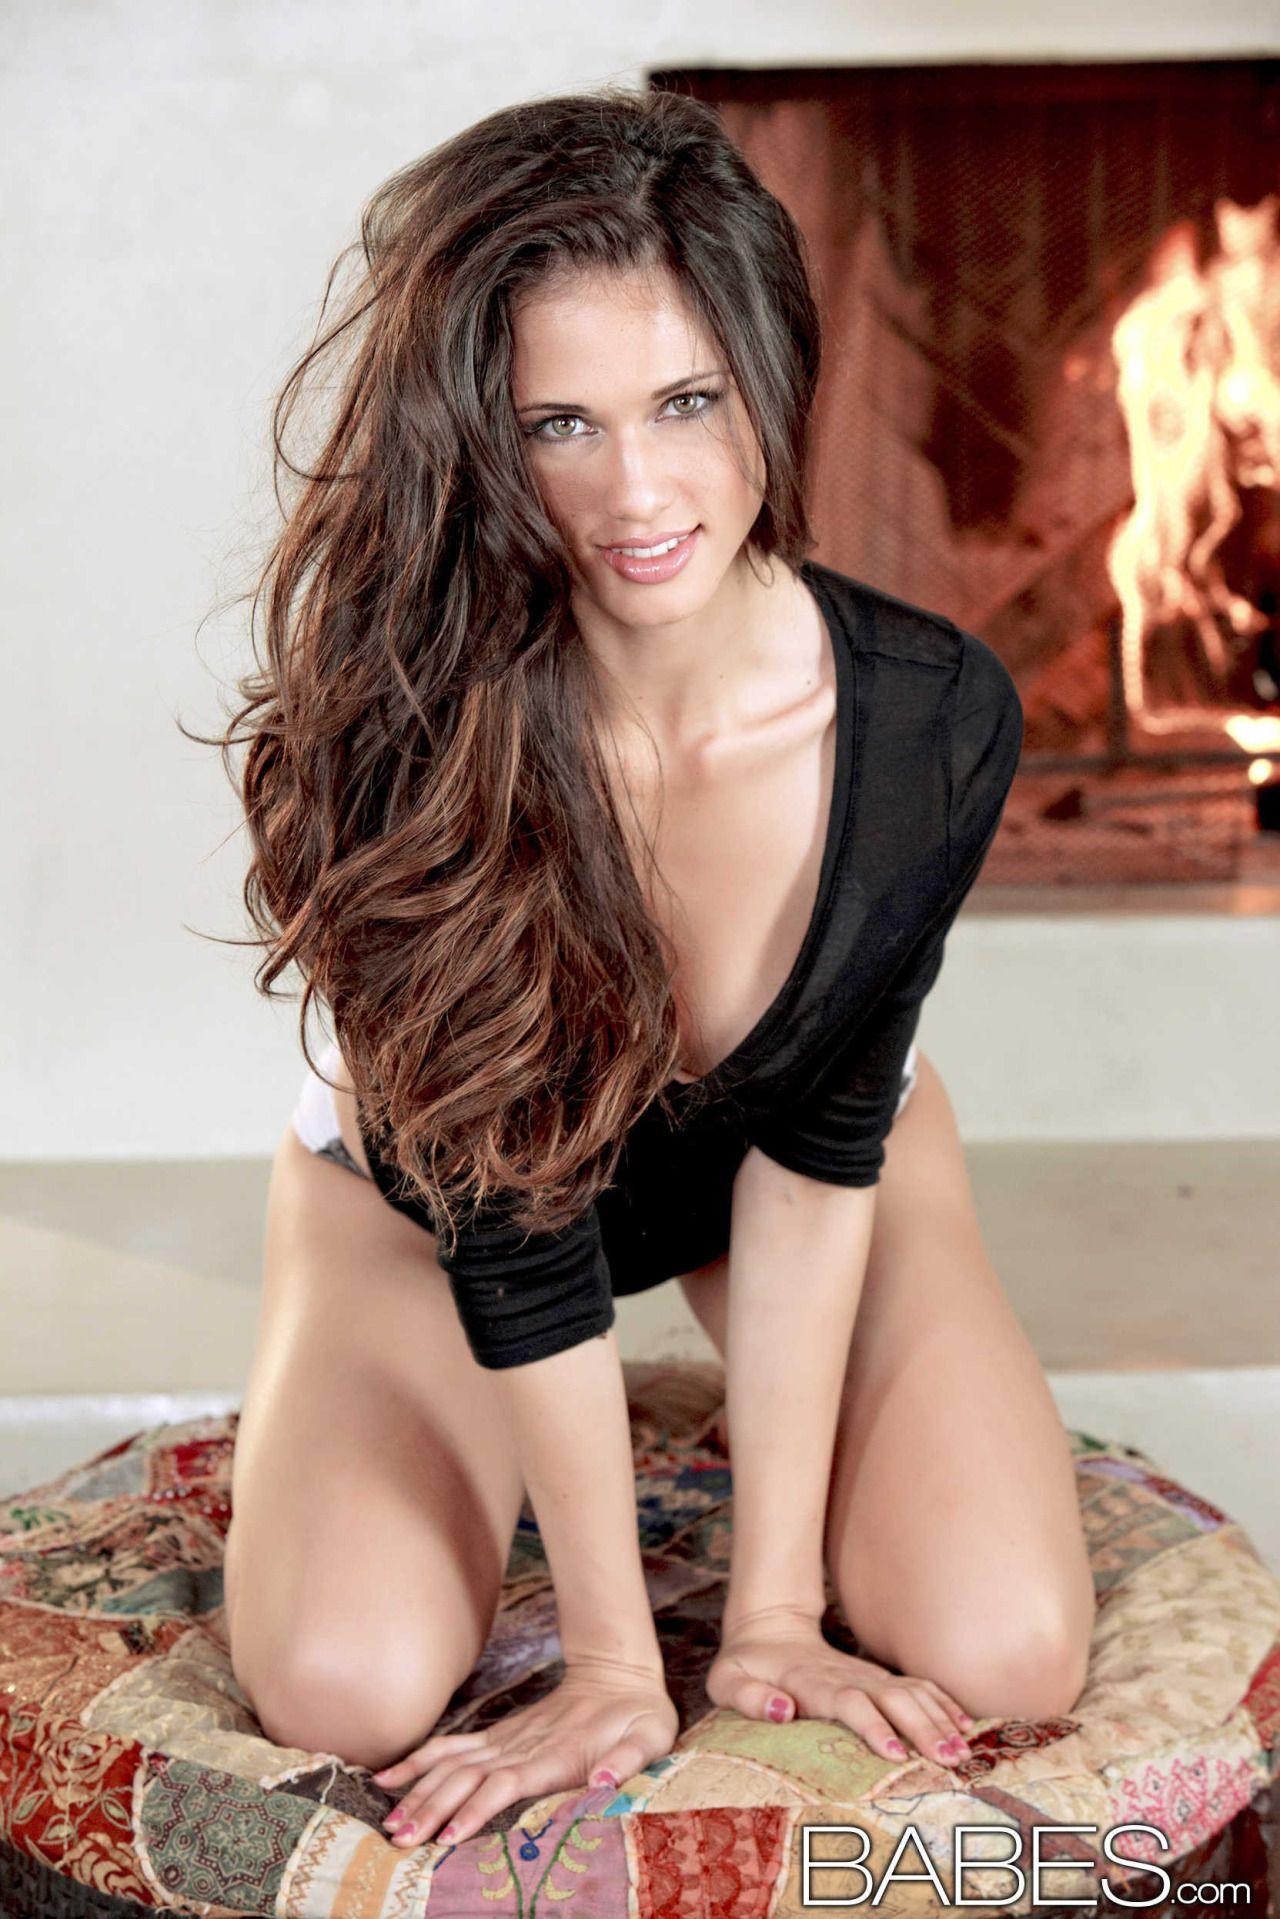 simple and Amature Freundin Handjob Bilder very sexual and loves